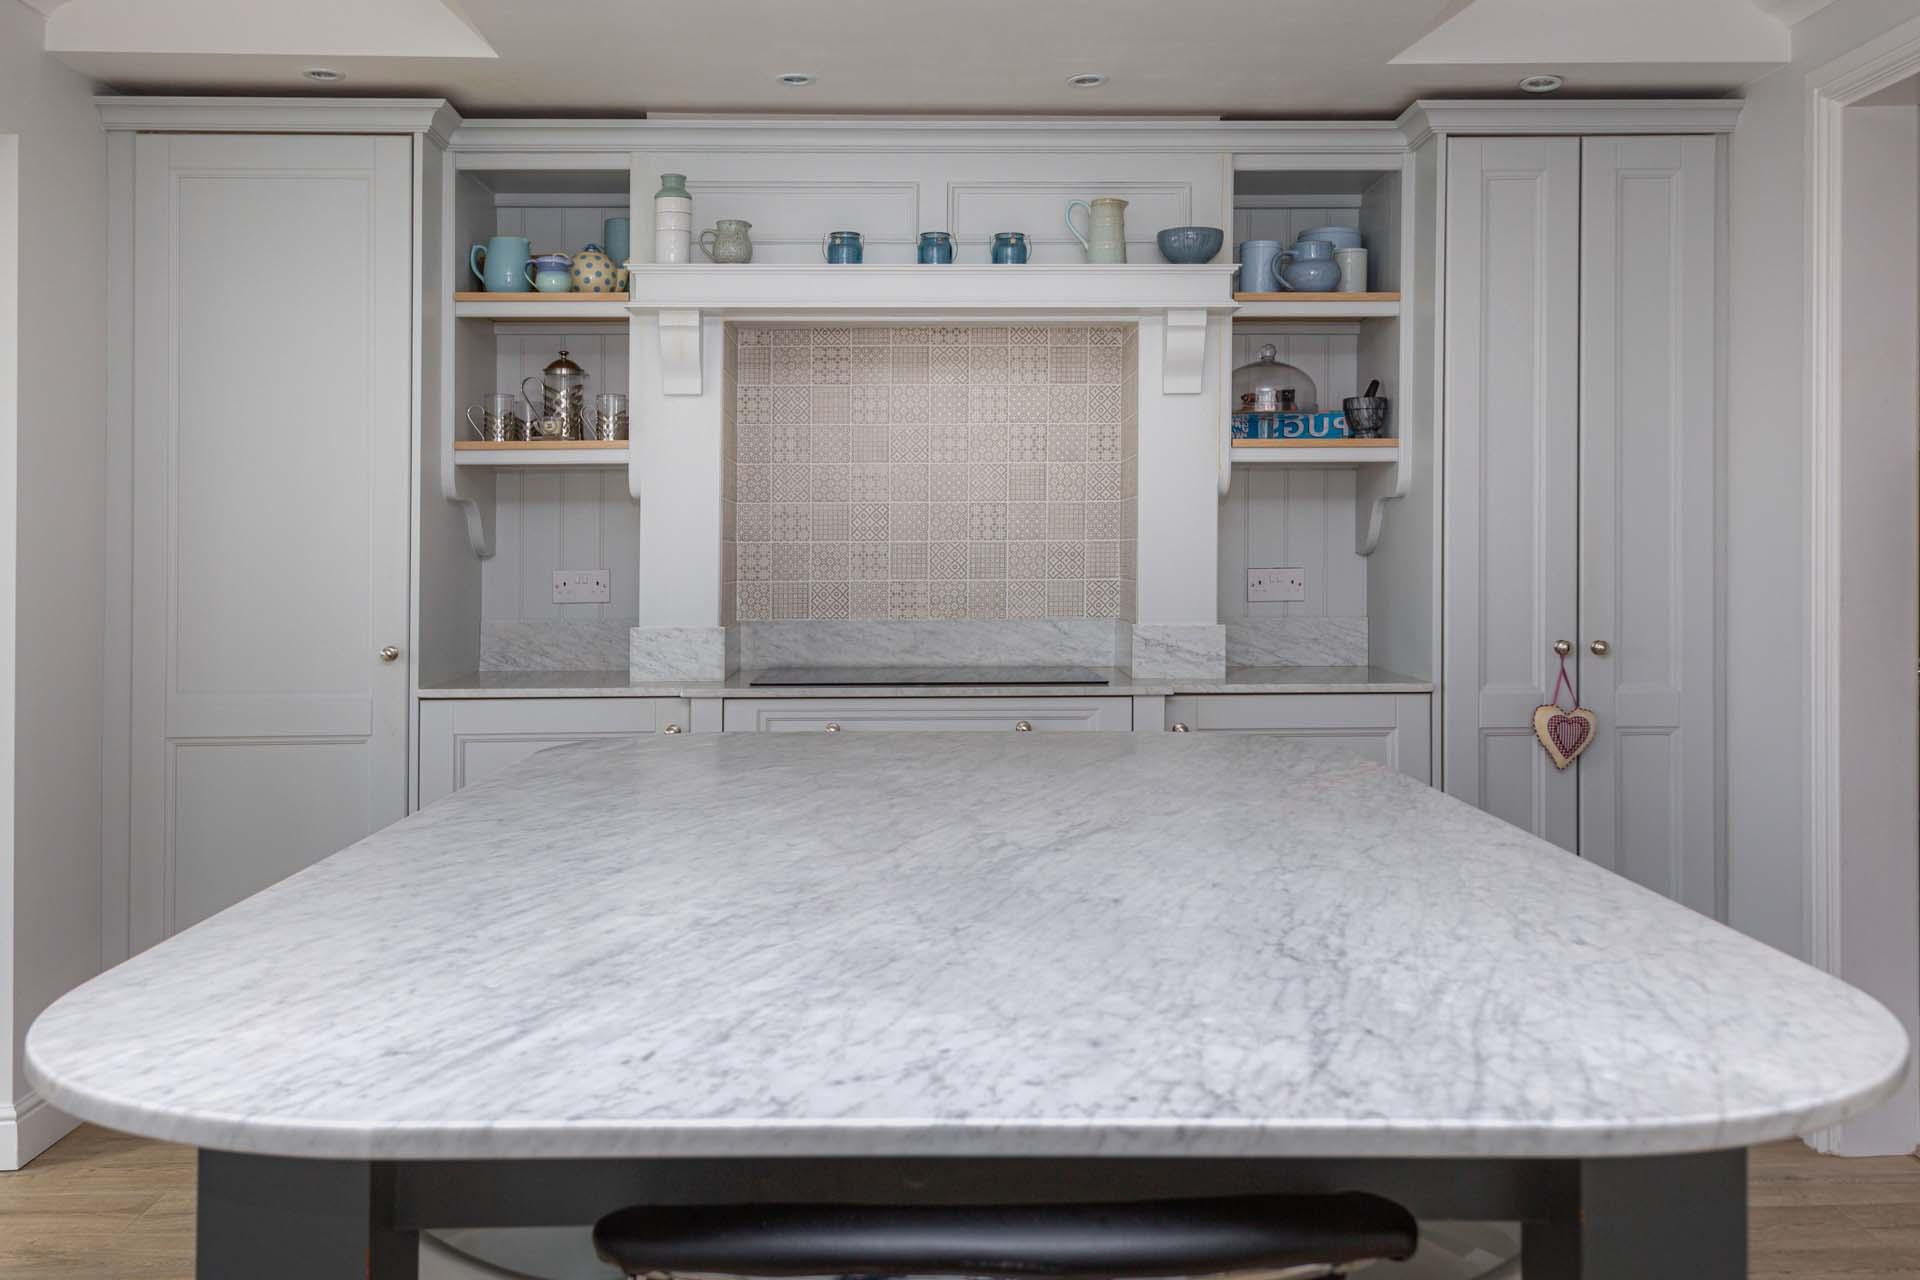 marble worktops kitchen problems staining 074658